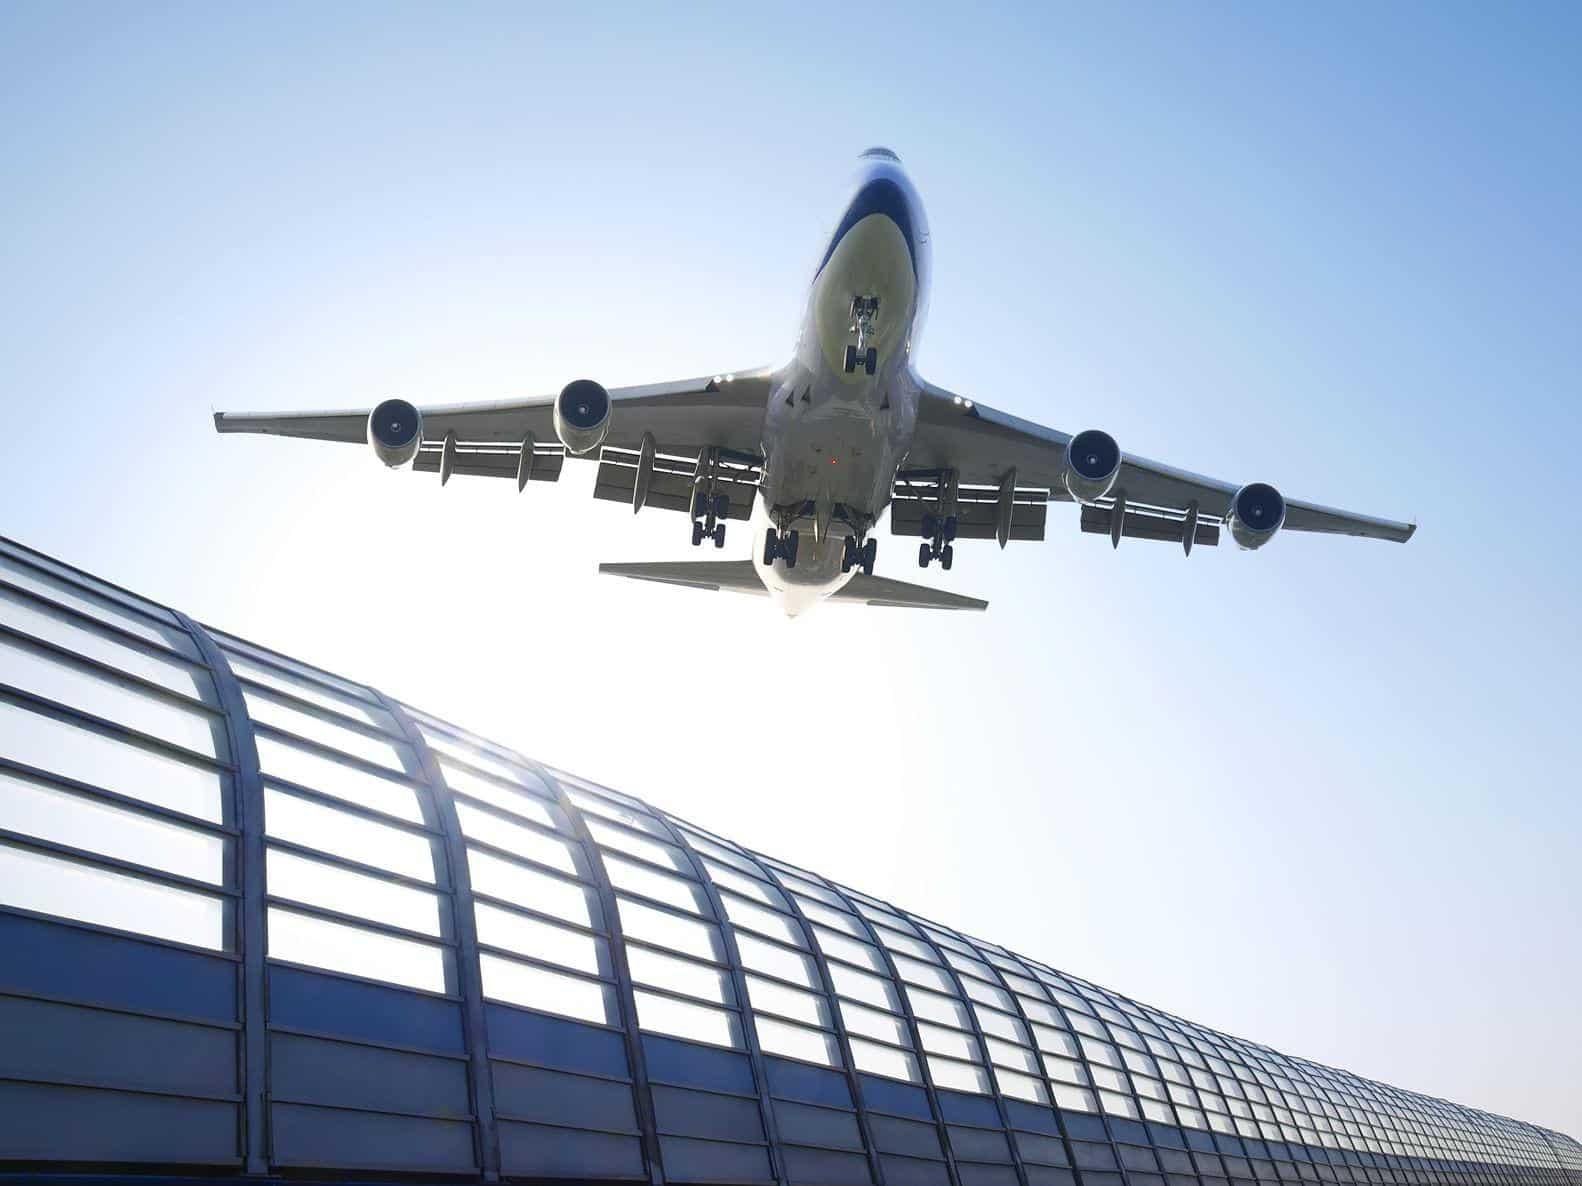 Alaska Pilot Awarded $500K in Airplane Safety Whistleblower Case